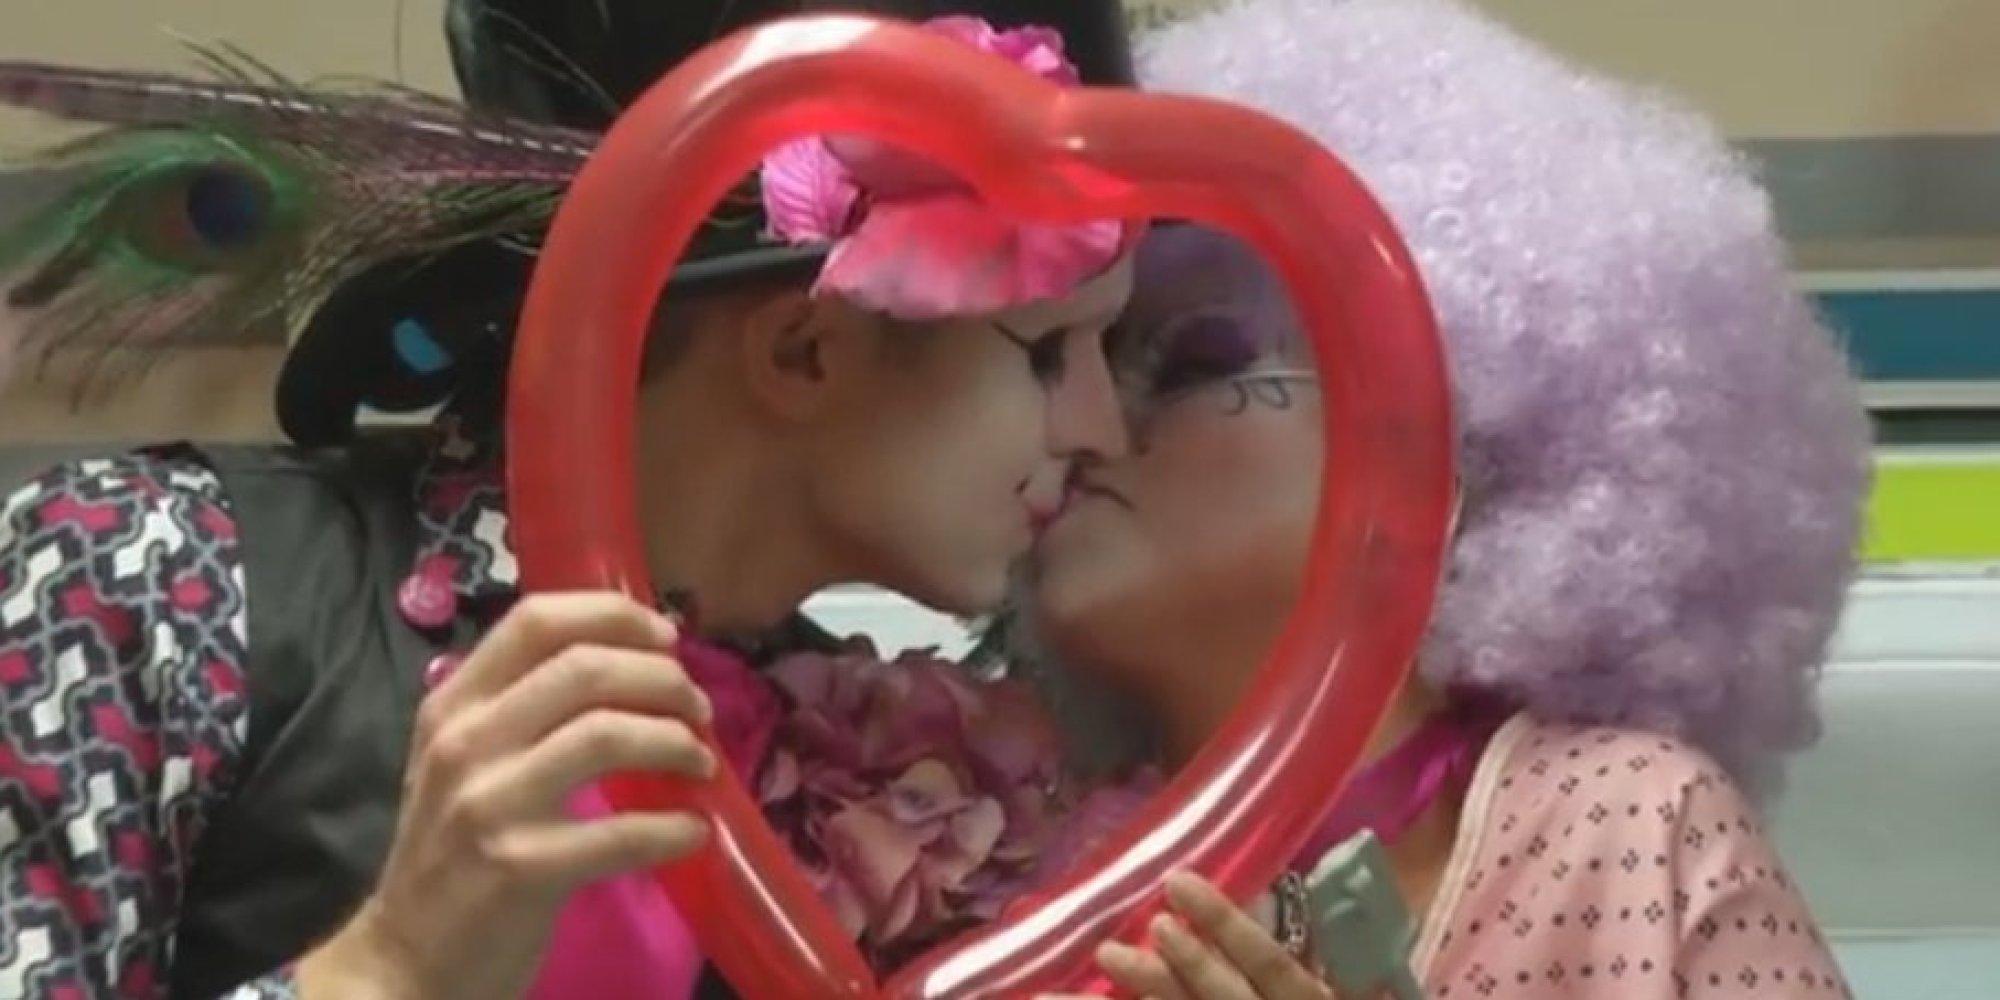 Balloon Sex Really Blows For Kinky Clown Couple   HuffPost